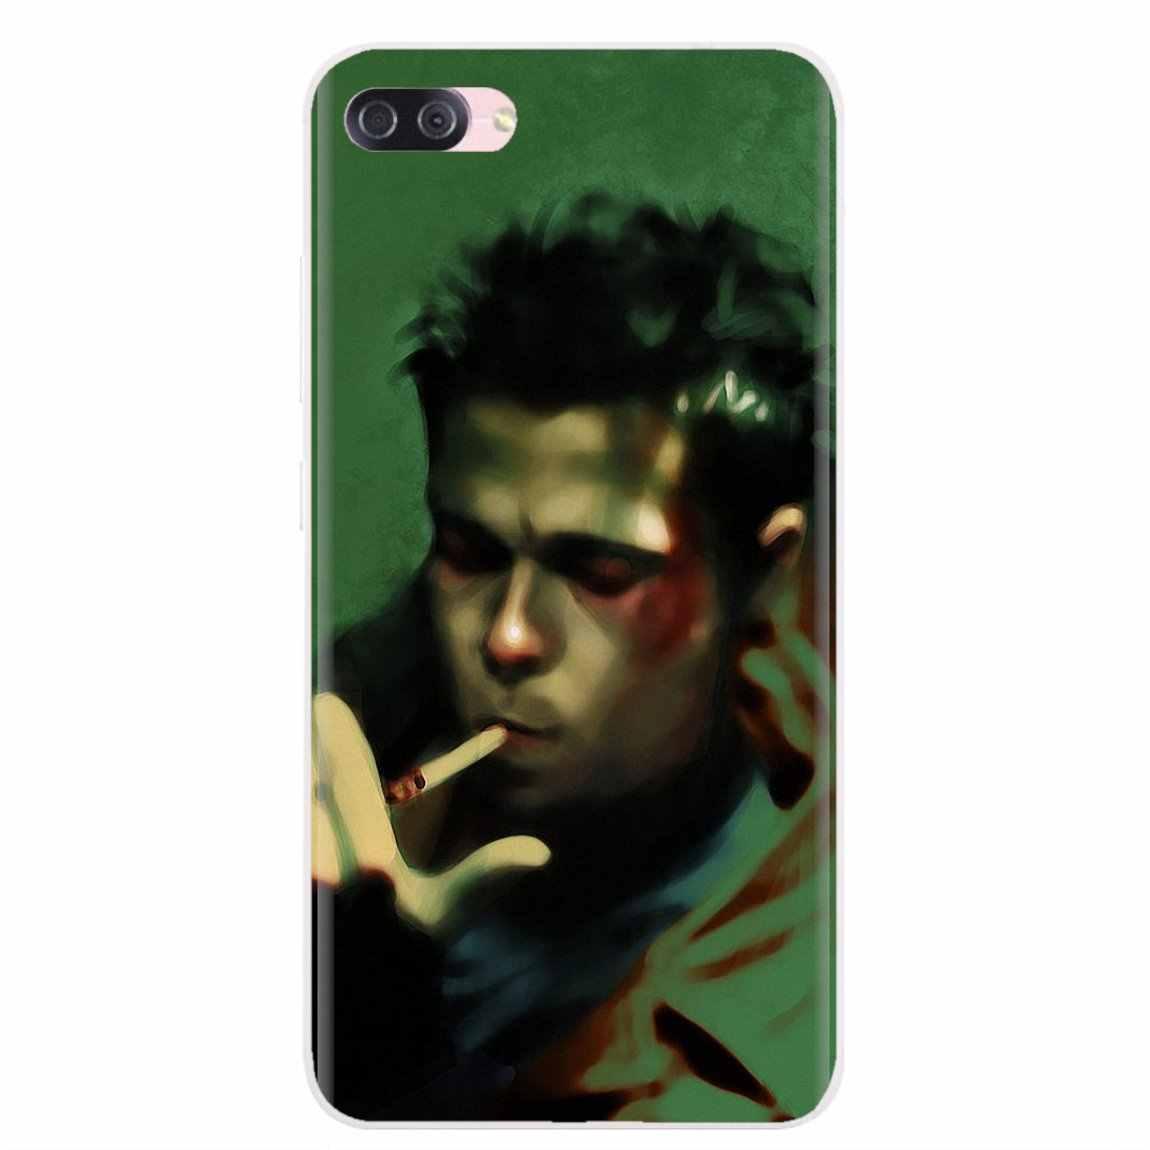 For Samsung Galaxy A3 A5 A7 A9 A8 Star Lite A6 Plus 2018 2015 2016 2017 Silicone Skin Case edward norton fight club tyler durden